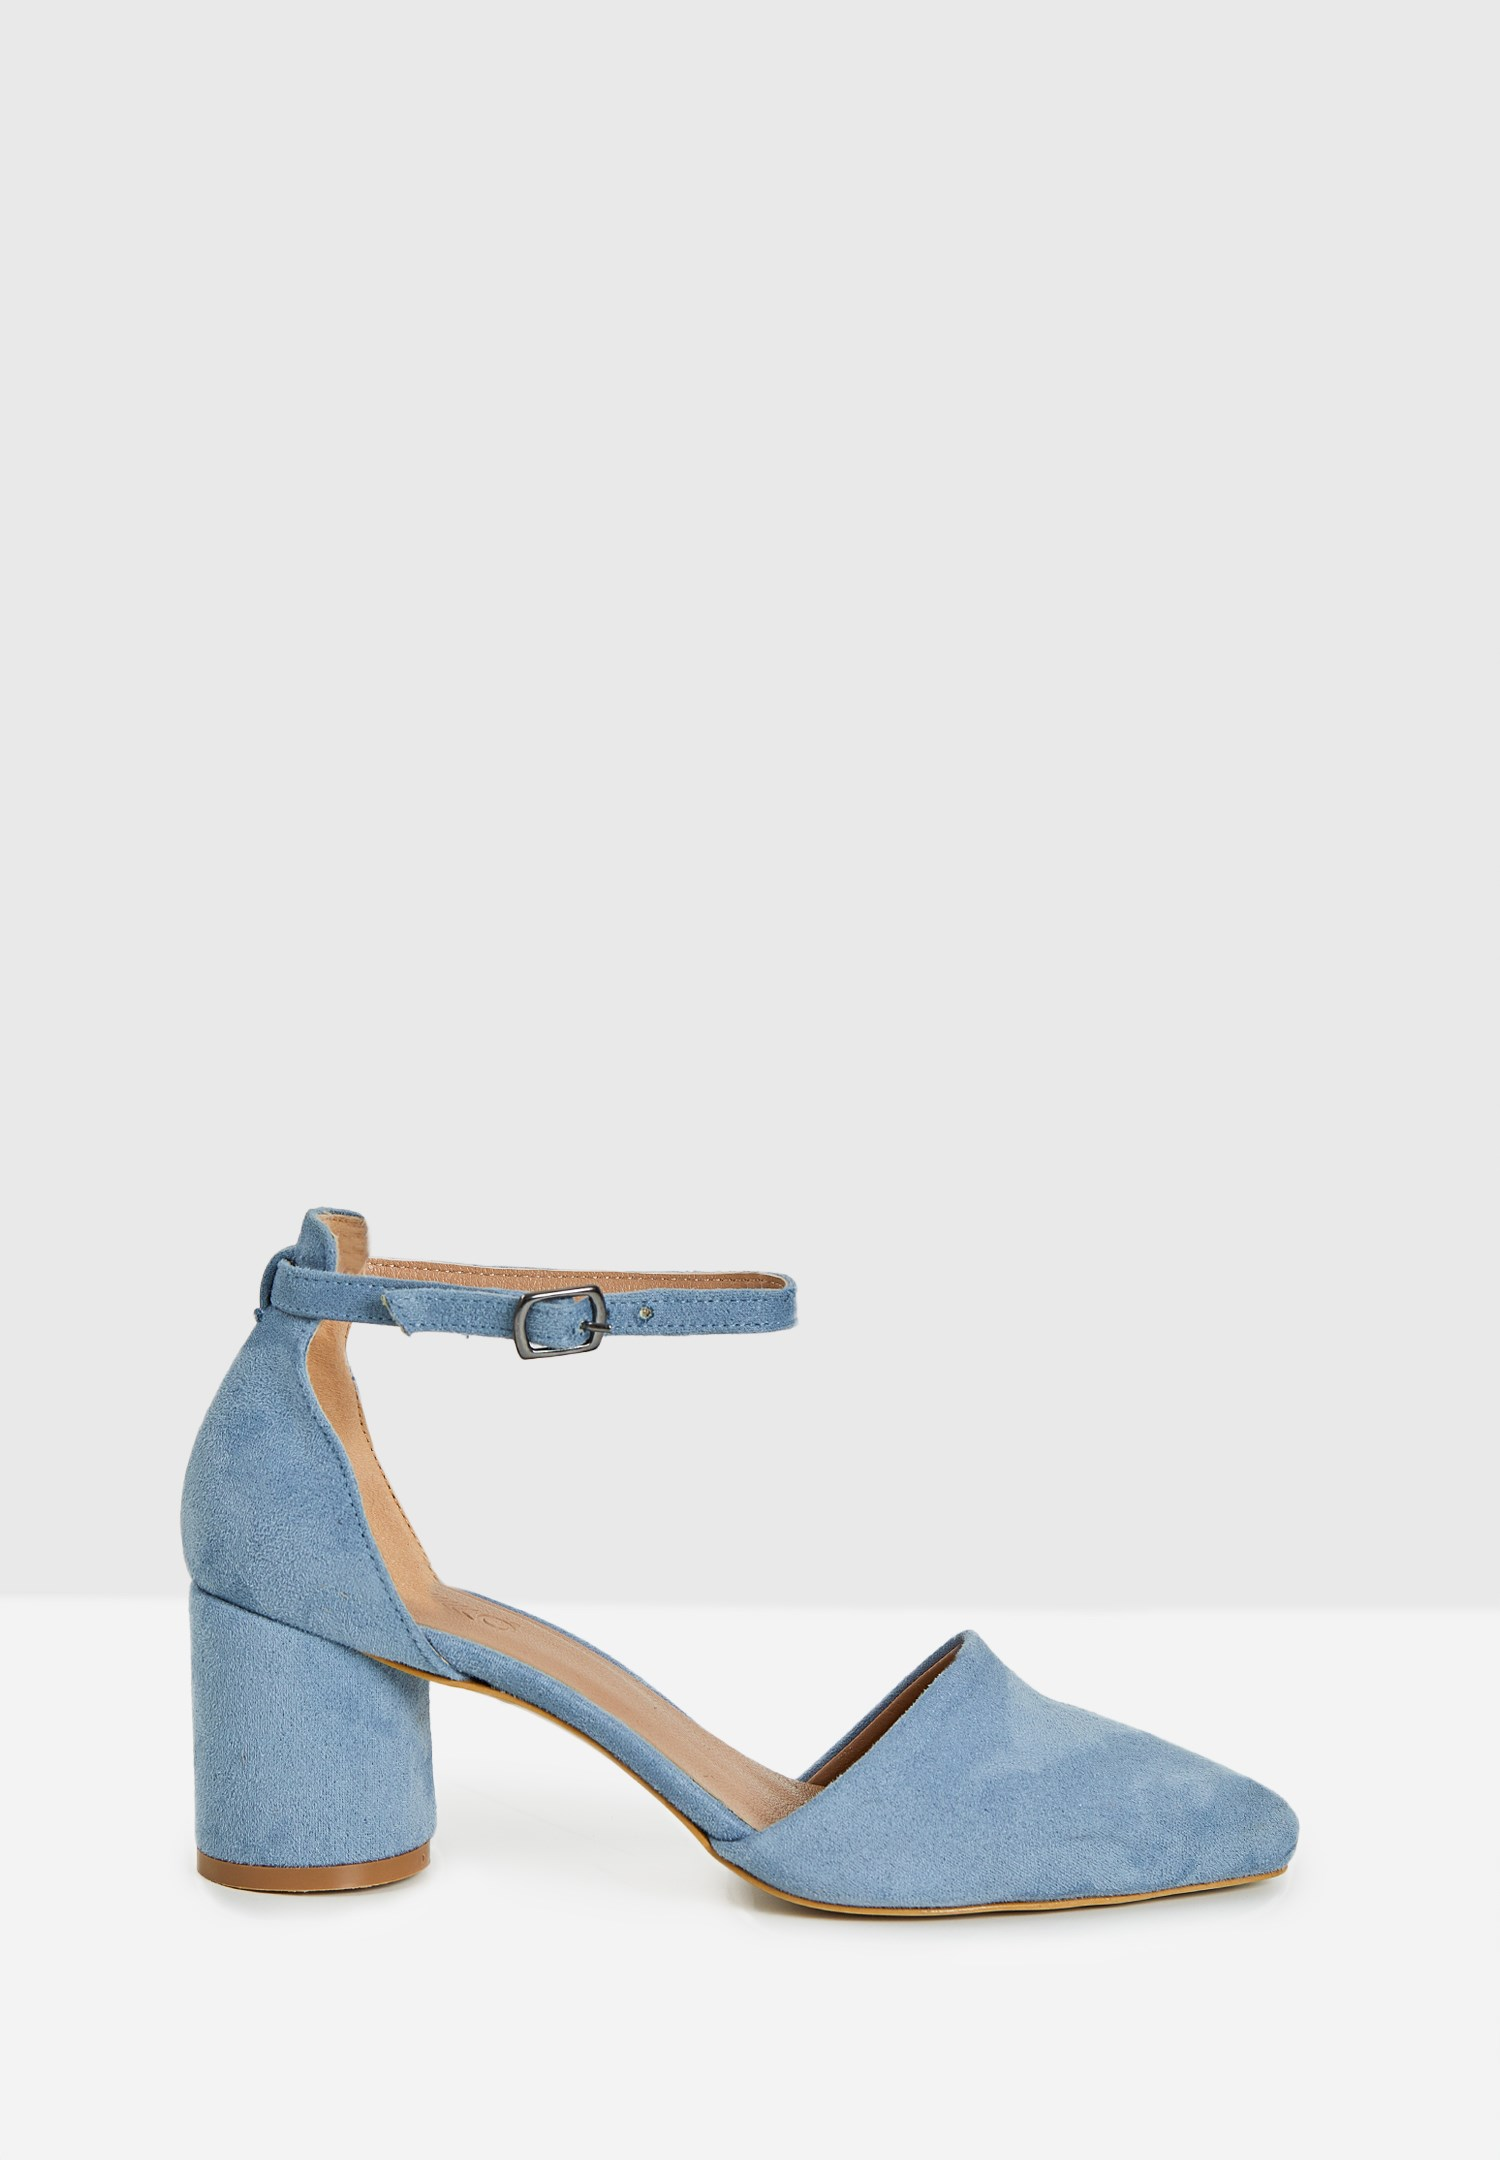 Bayan Mavi Toka Detaylı Yuvarlak Topuklu Ayakkabı